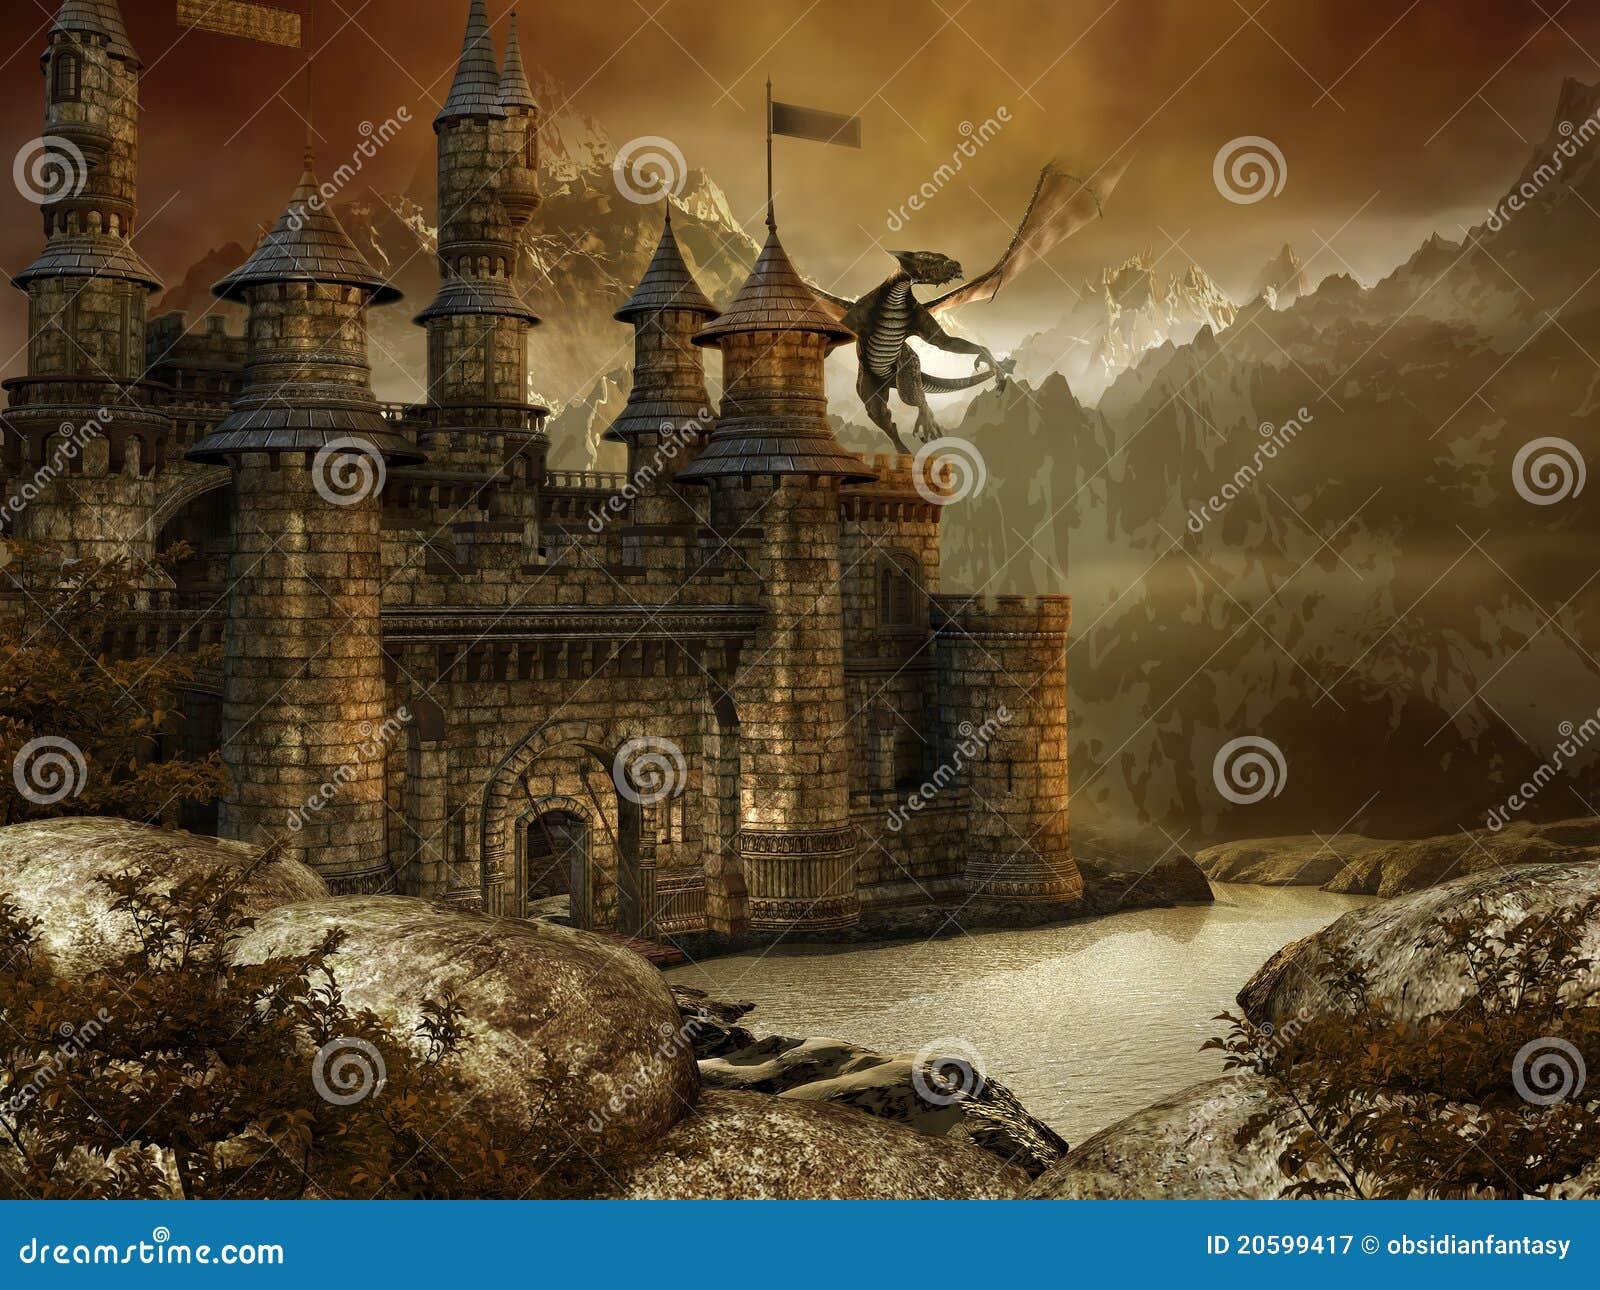 Fantasy landscape with a castle